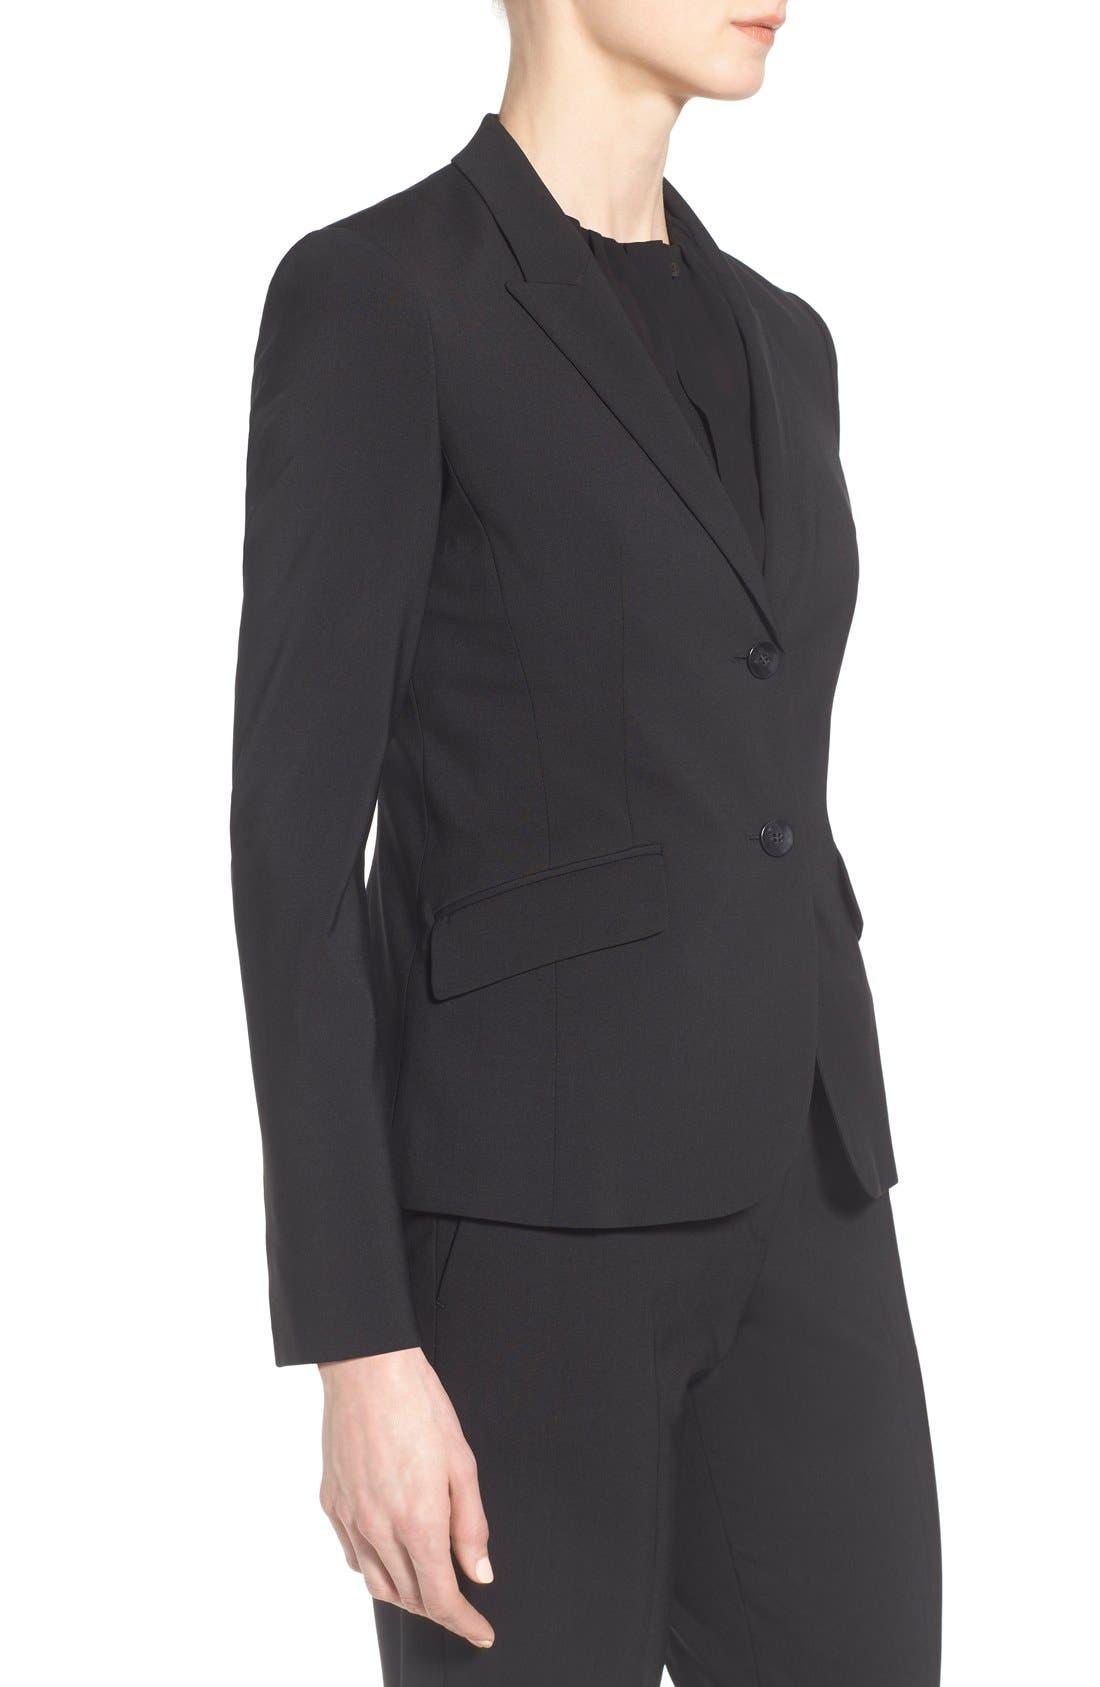 Julea Tropical Stretch Wool Jacket,                             Alternate thumbnail 8, color,                             BLACK